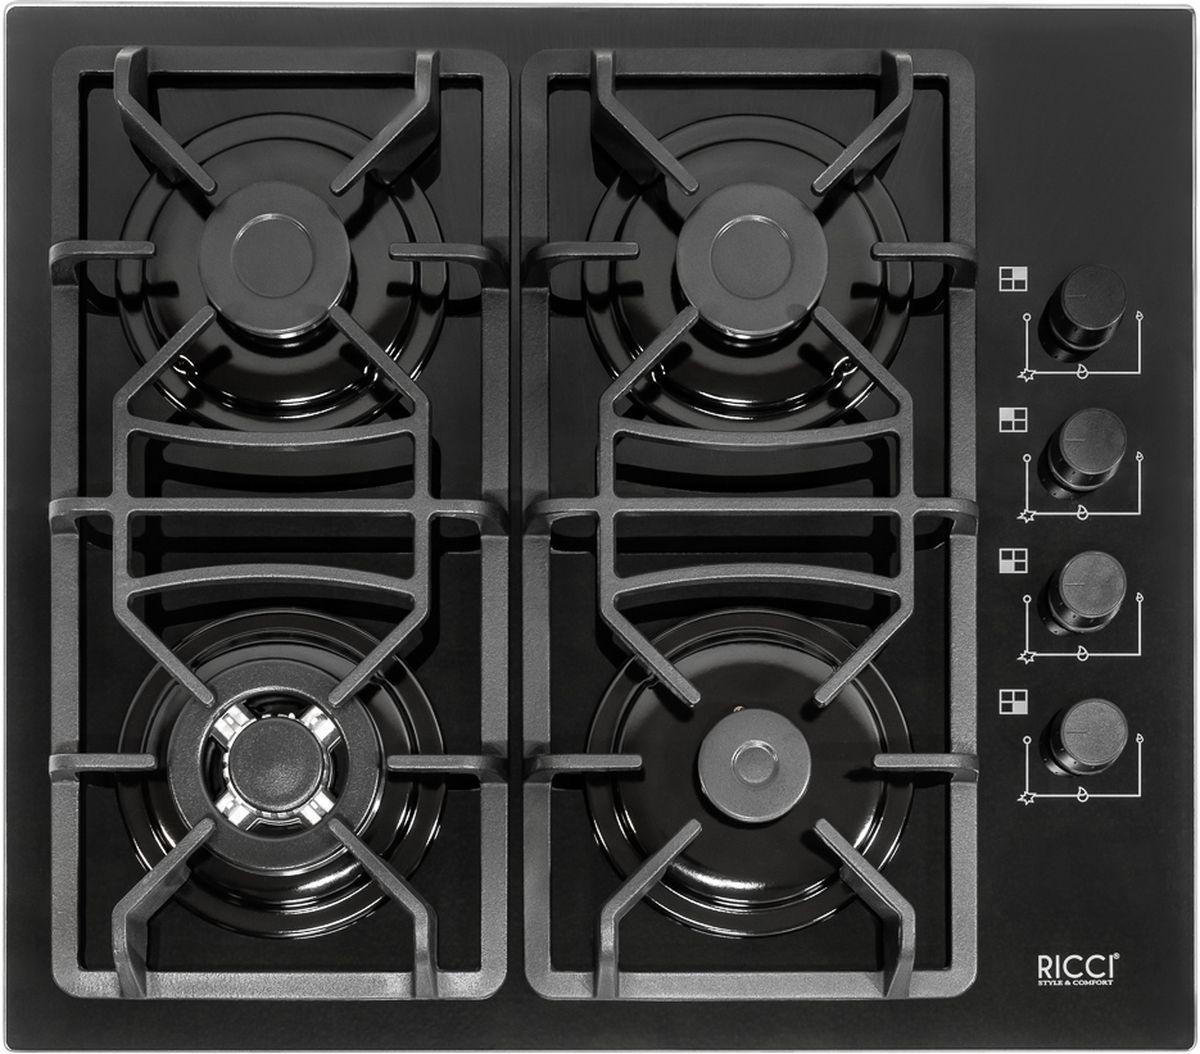 Ricci RGN-670BL, Black варочная панель встраиваемая